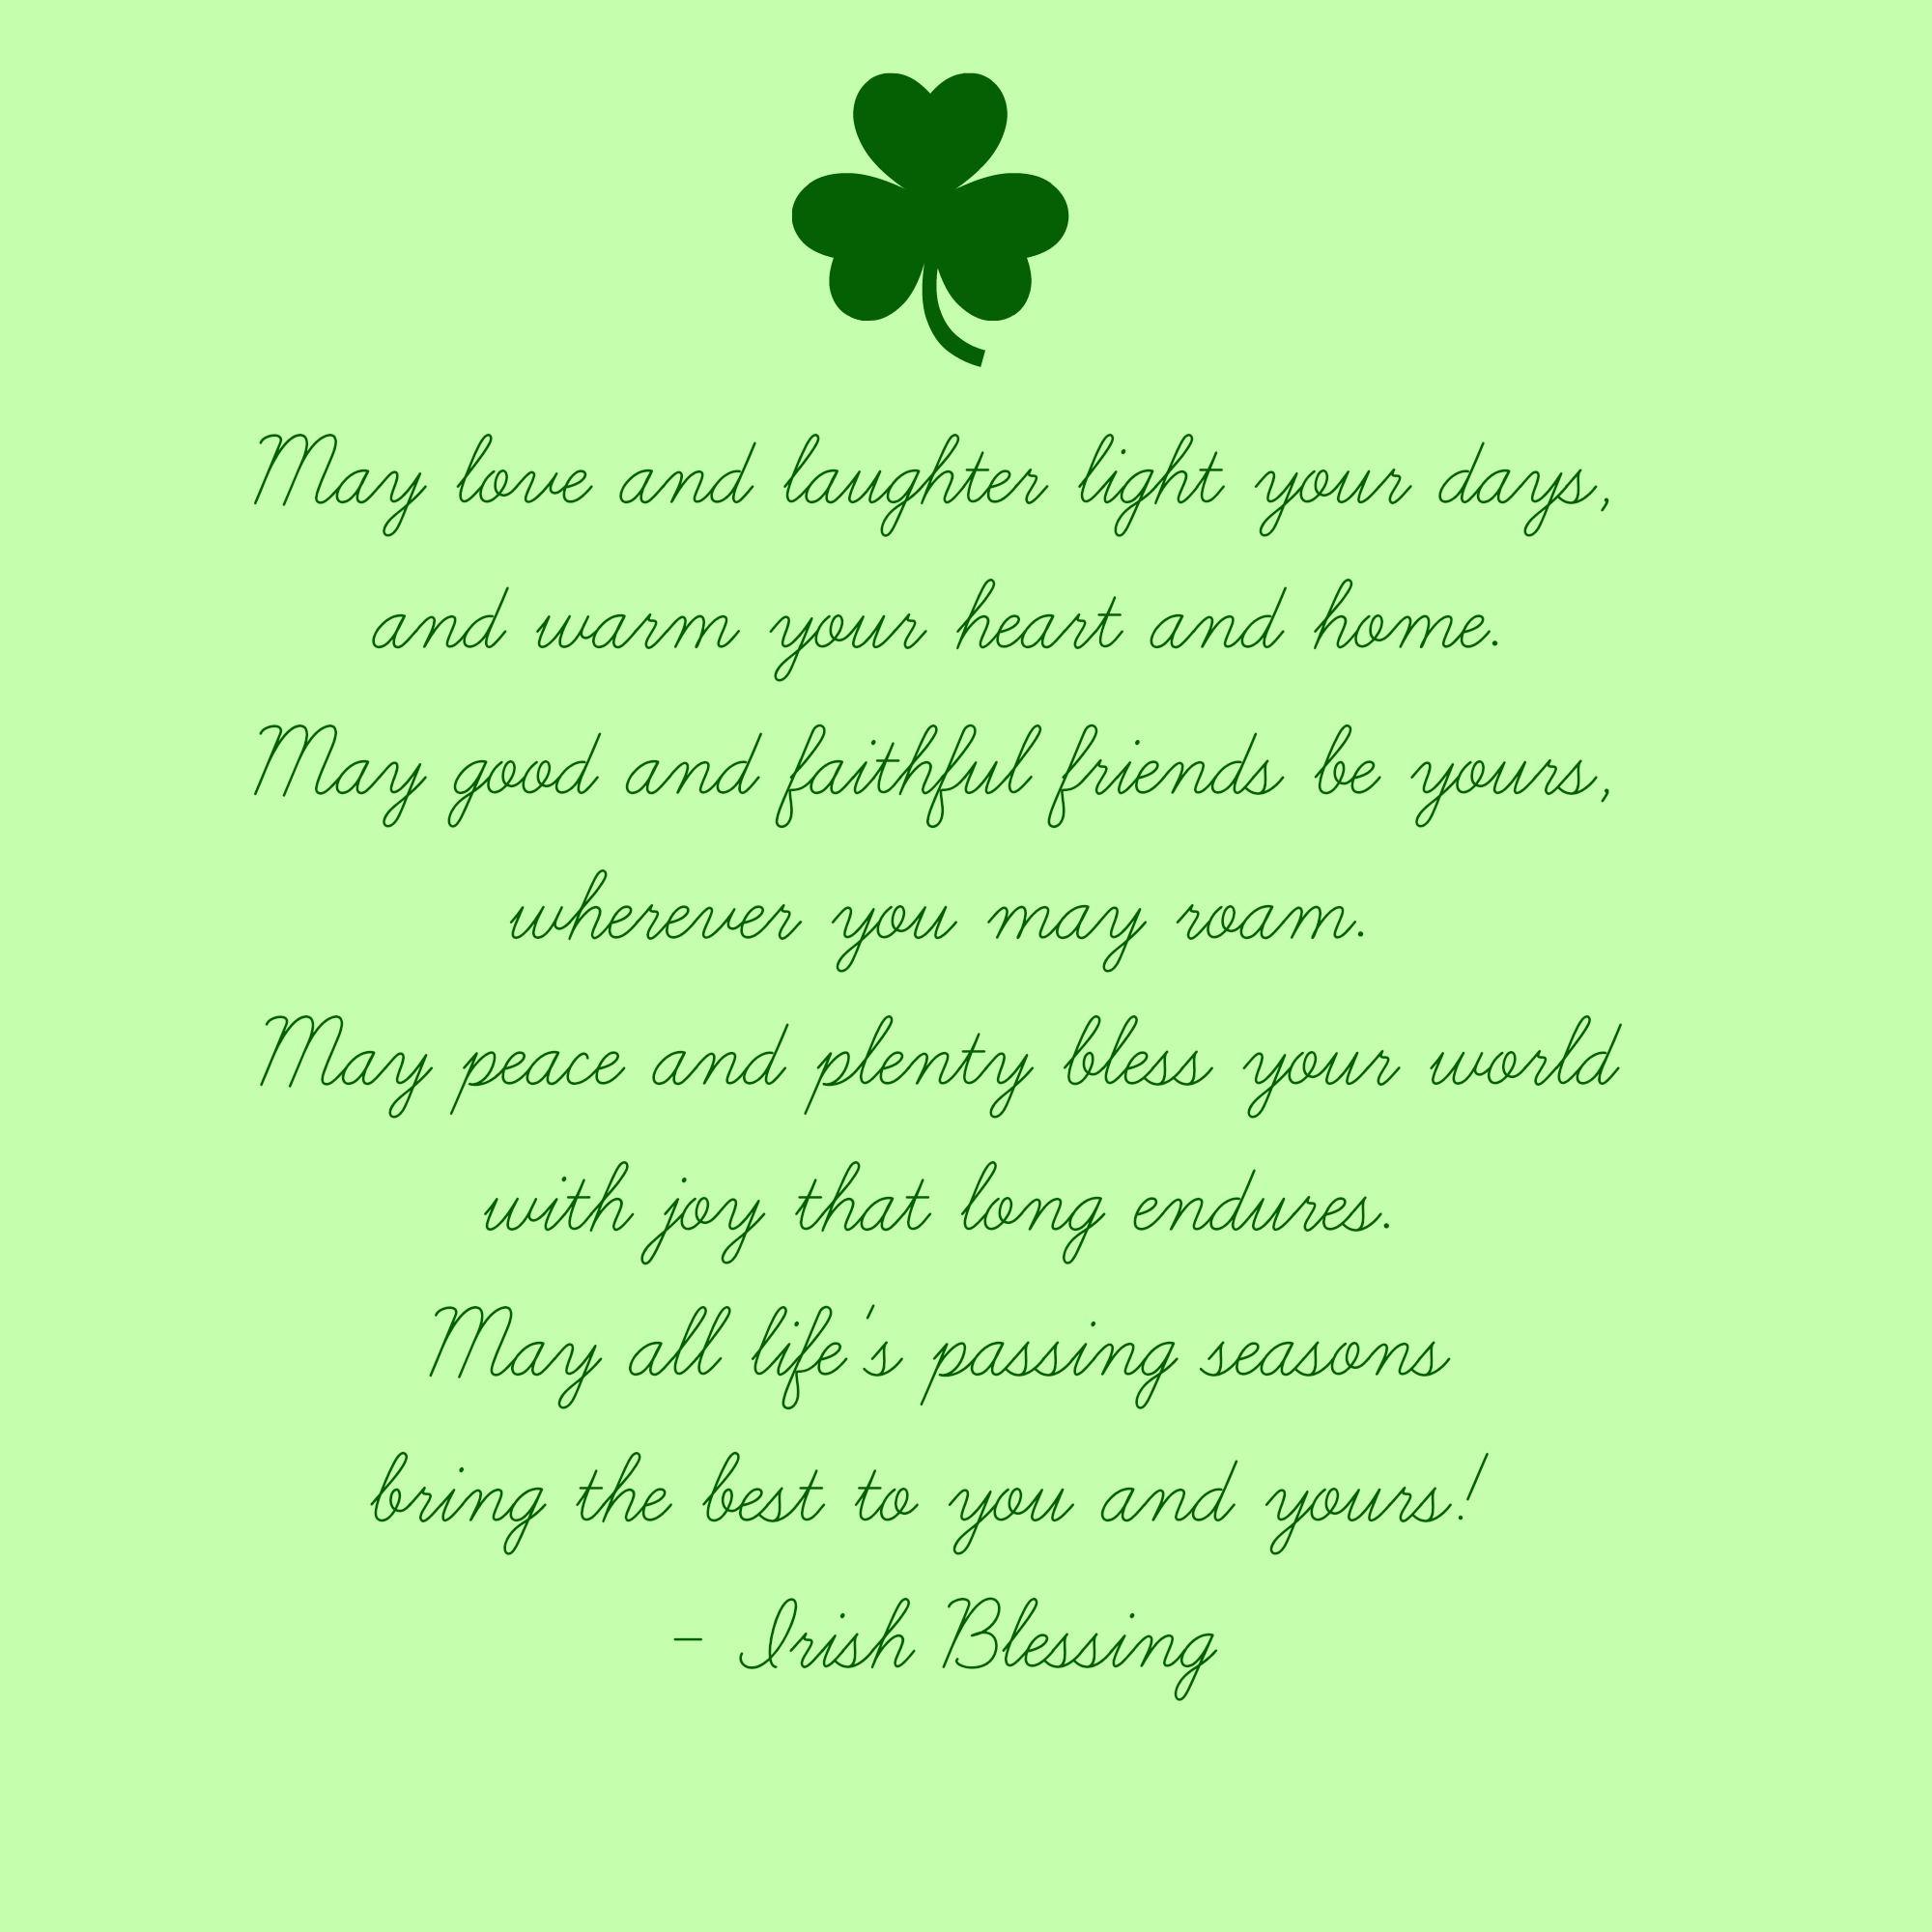 irish new year blessing - Google Search | sayings | Pinterest ...